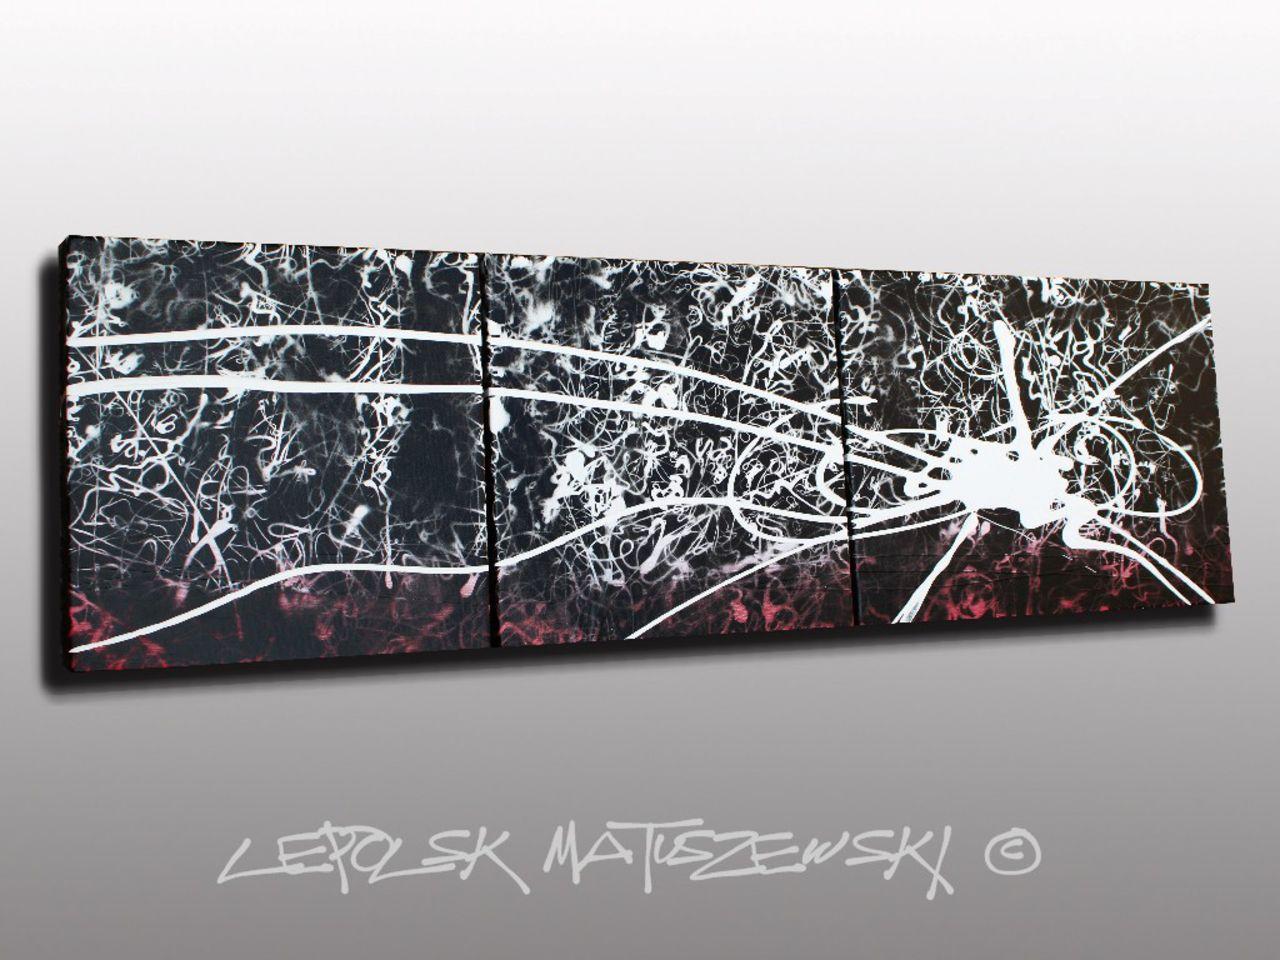 MISTER K  (Lepolsk Matuszewski) INCANDESCENCE  Expressionnisme abstrait contemporain